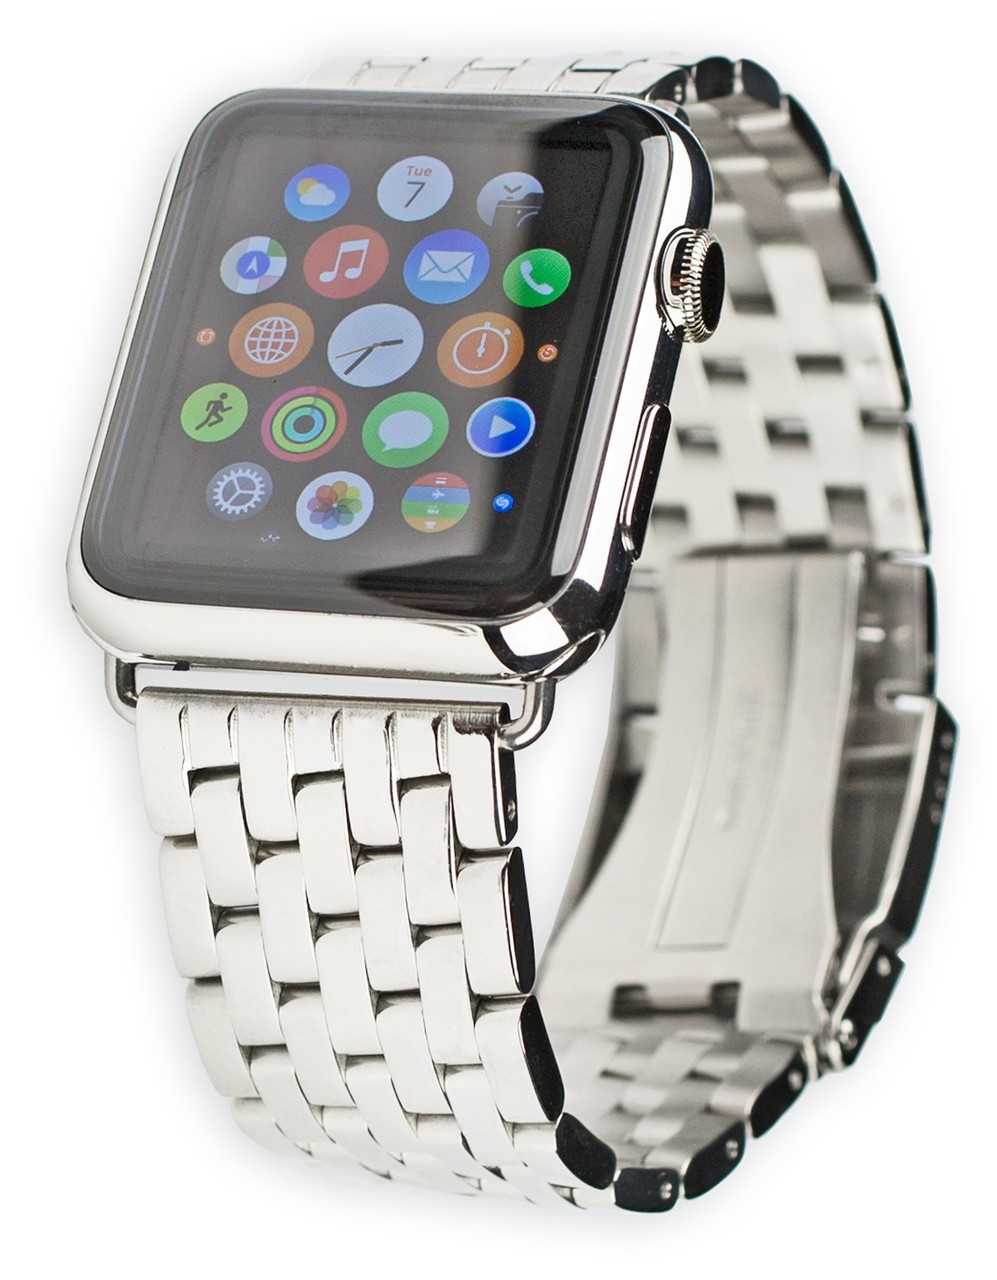 2930e1d9e6f Breitling Navitimer Style Metal Watch Band - Fits 42mm   44mm Apple Watch